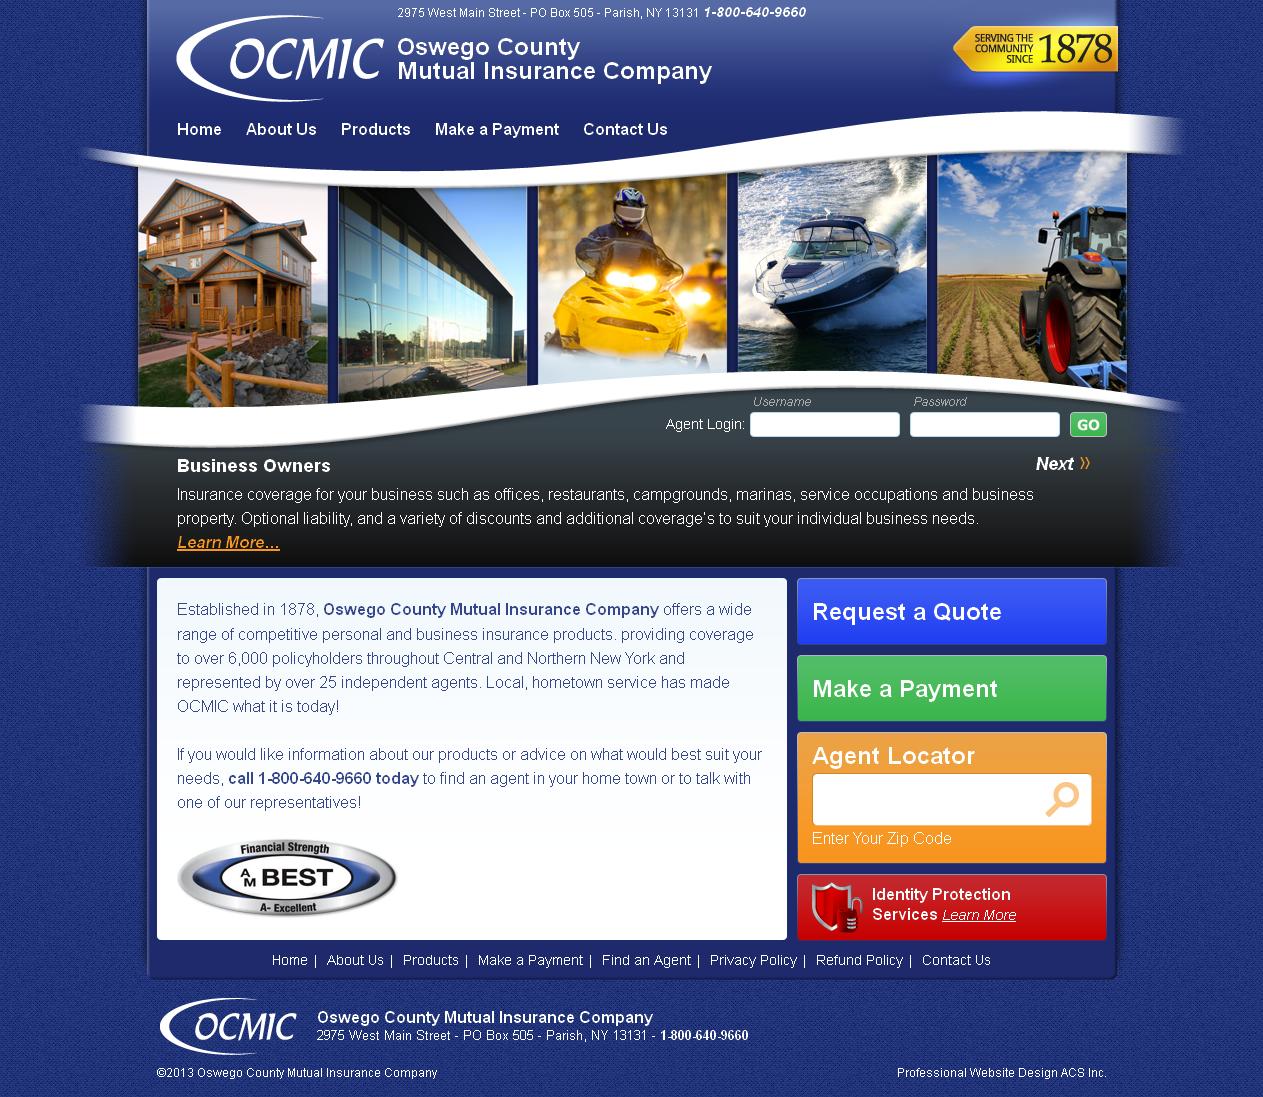 Insurance Website Design January 2012 Designed By Acs Www Acs Web Com Www Ocmic Com Insurance Website Website Design Insurance